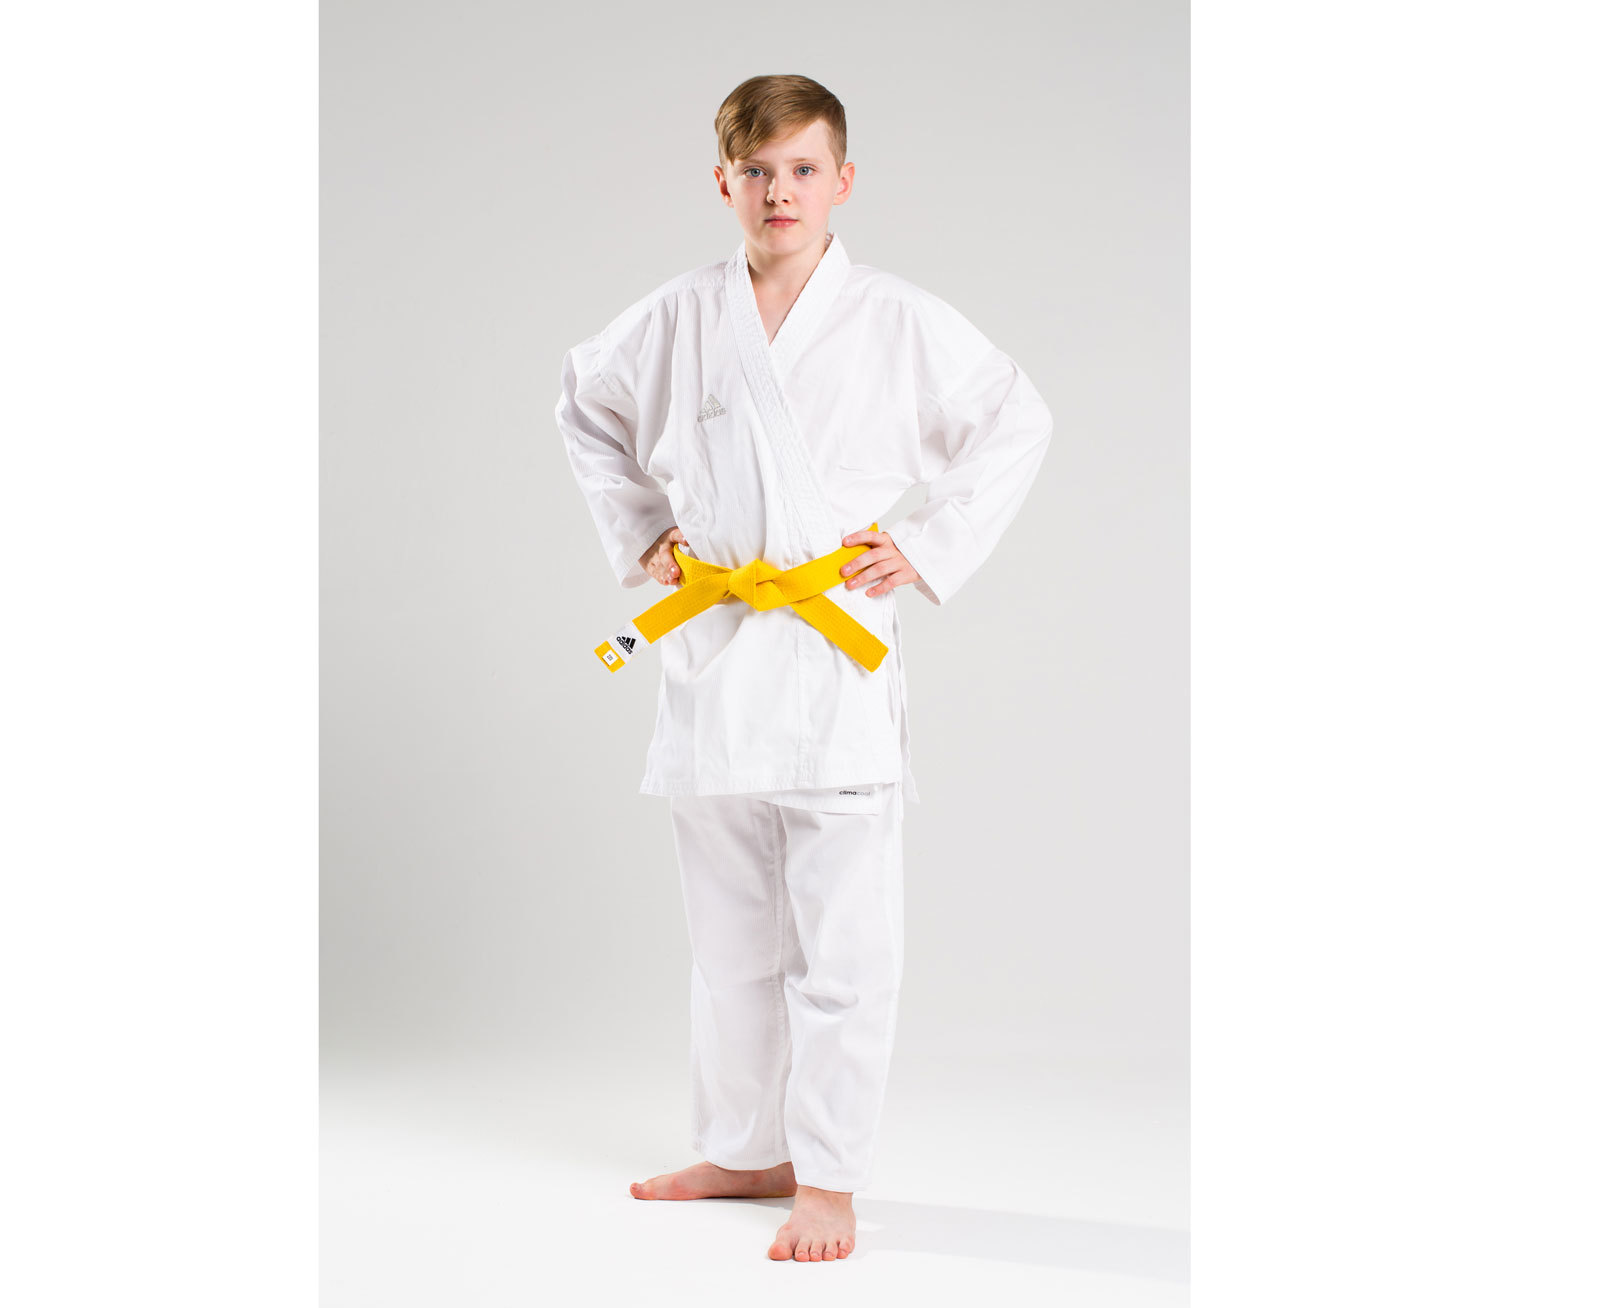 Кимоно КИМОНО ДЛЯ КАРАТЕ COMBAT WKF БЕЛОЕ kimono_dlya_karate_combat_wkf_beloe.jpg